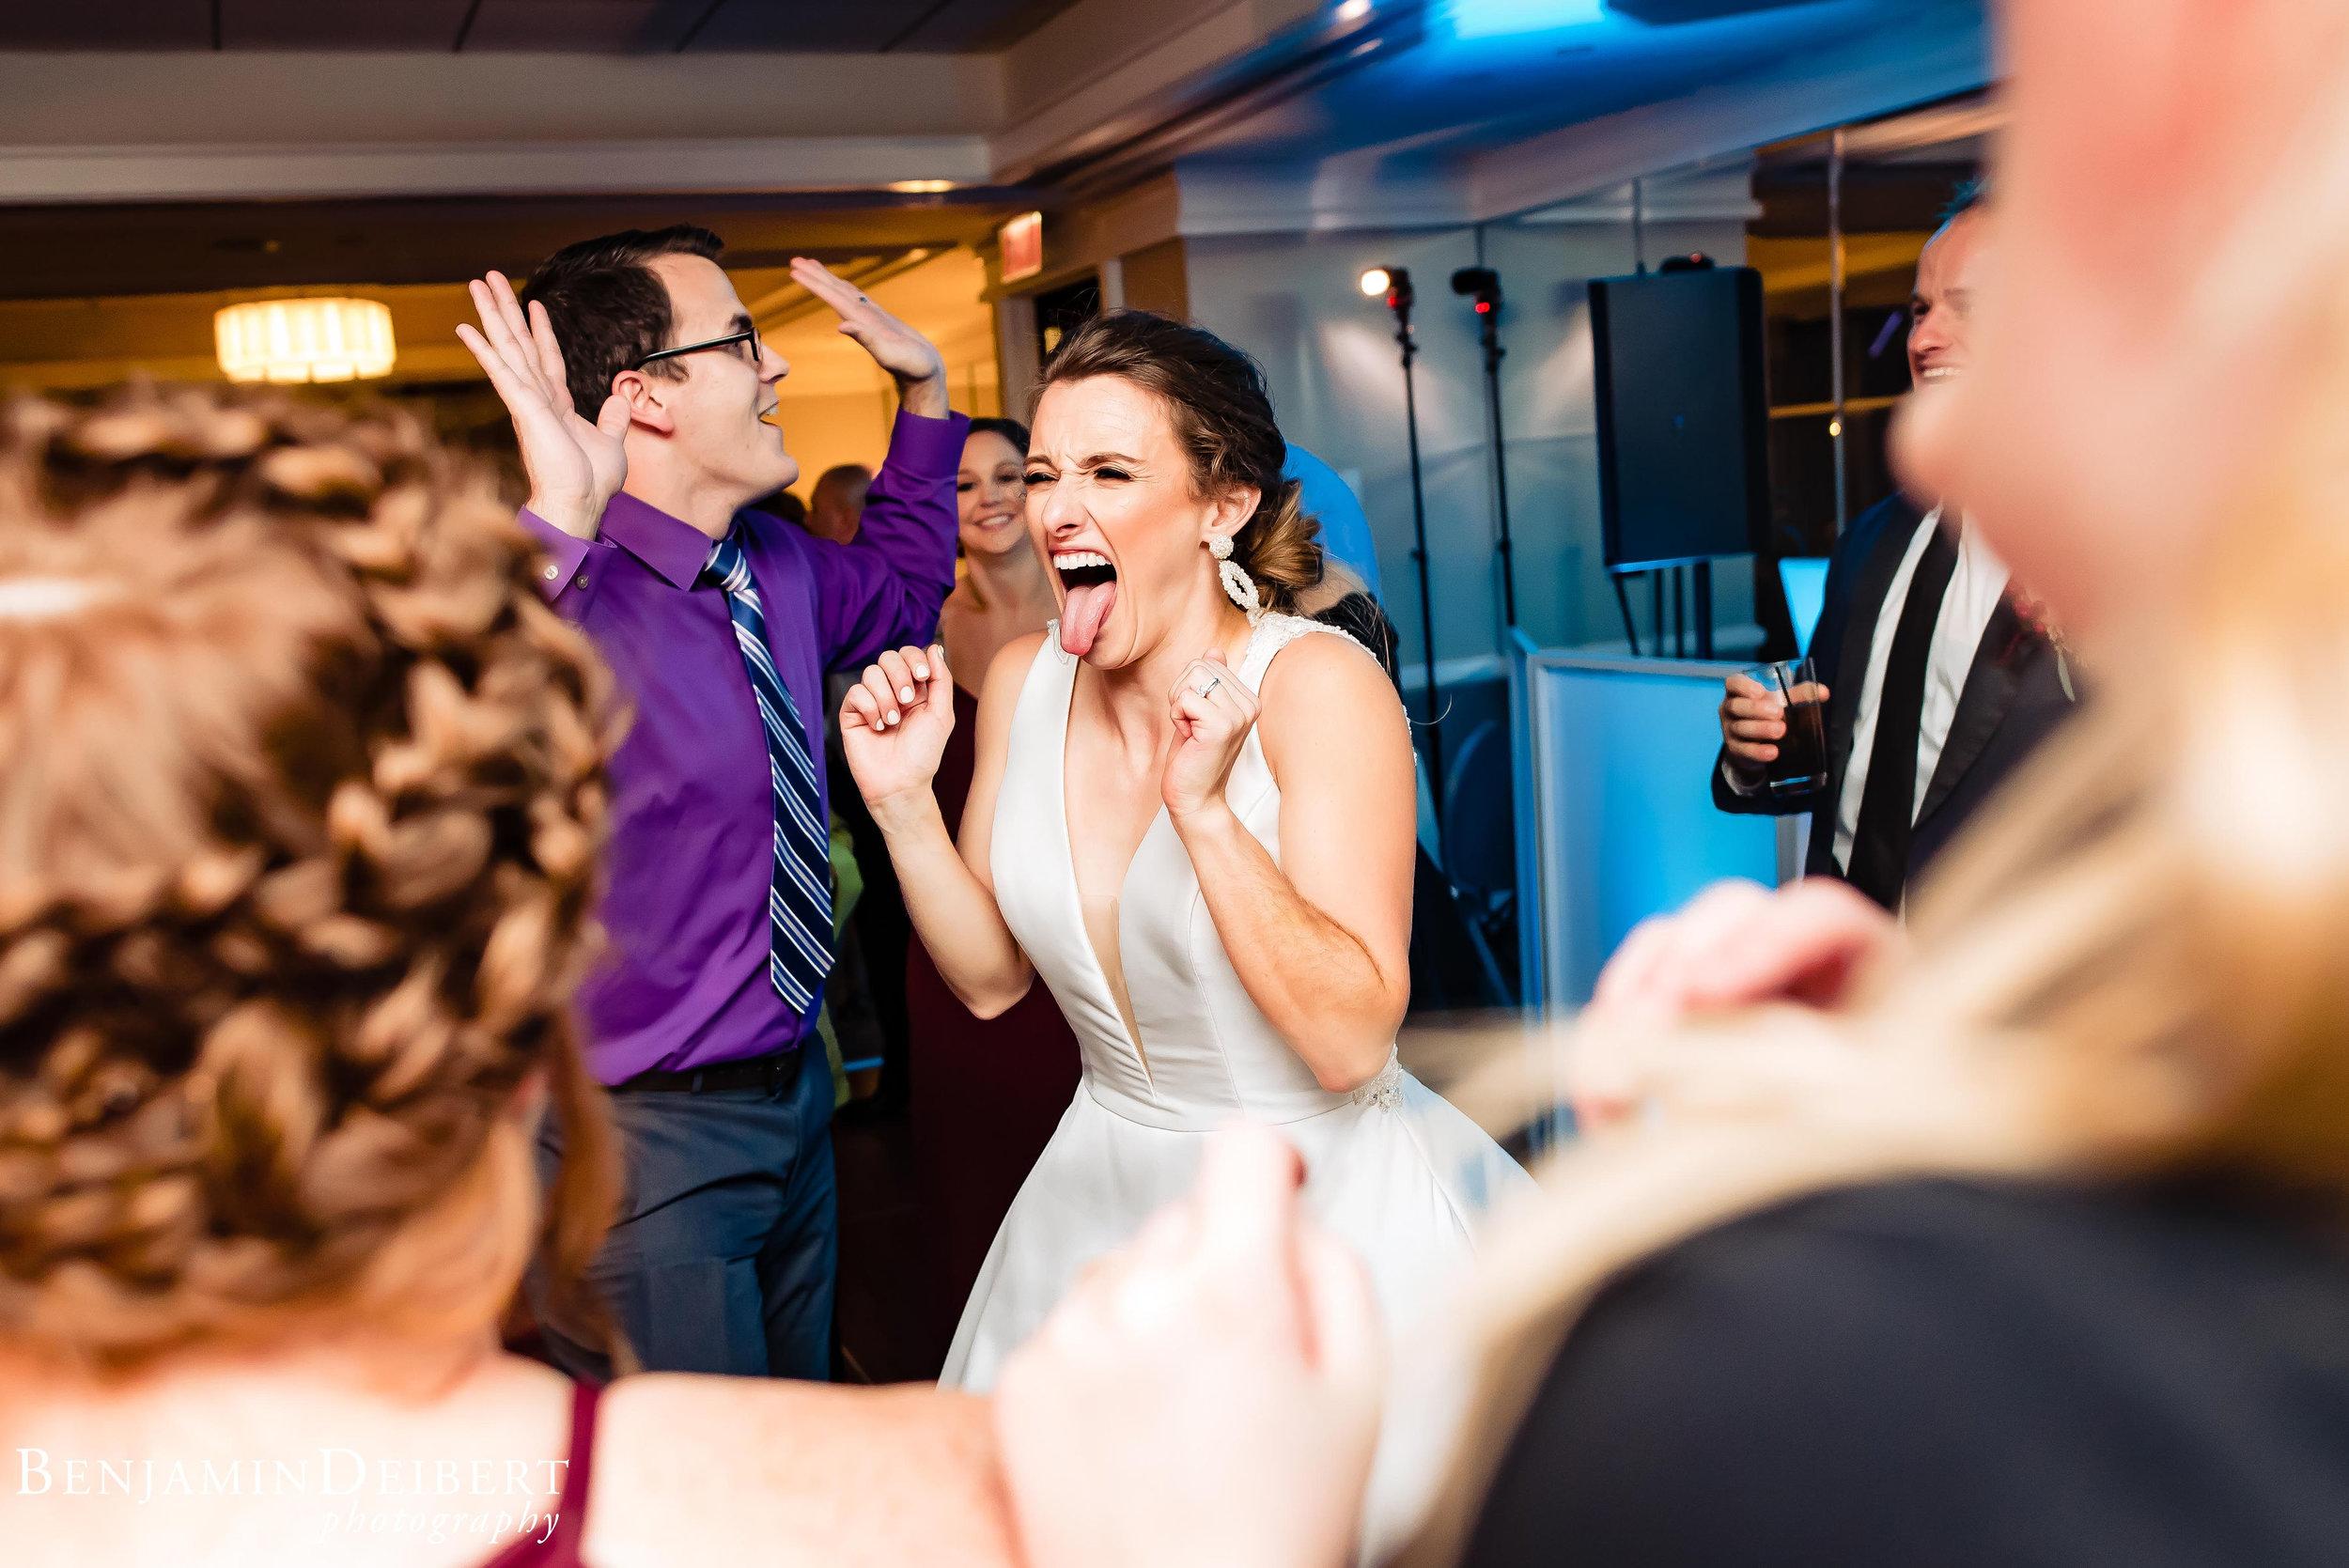 CatherineandDaniel_ThePyramidClub_Wedding-78.jpg